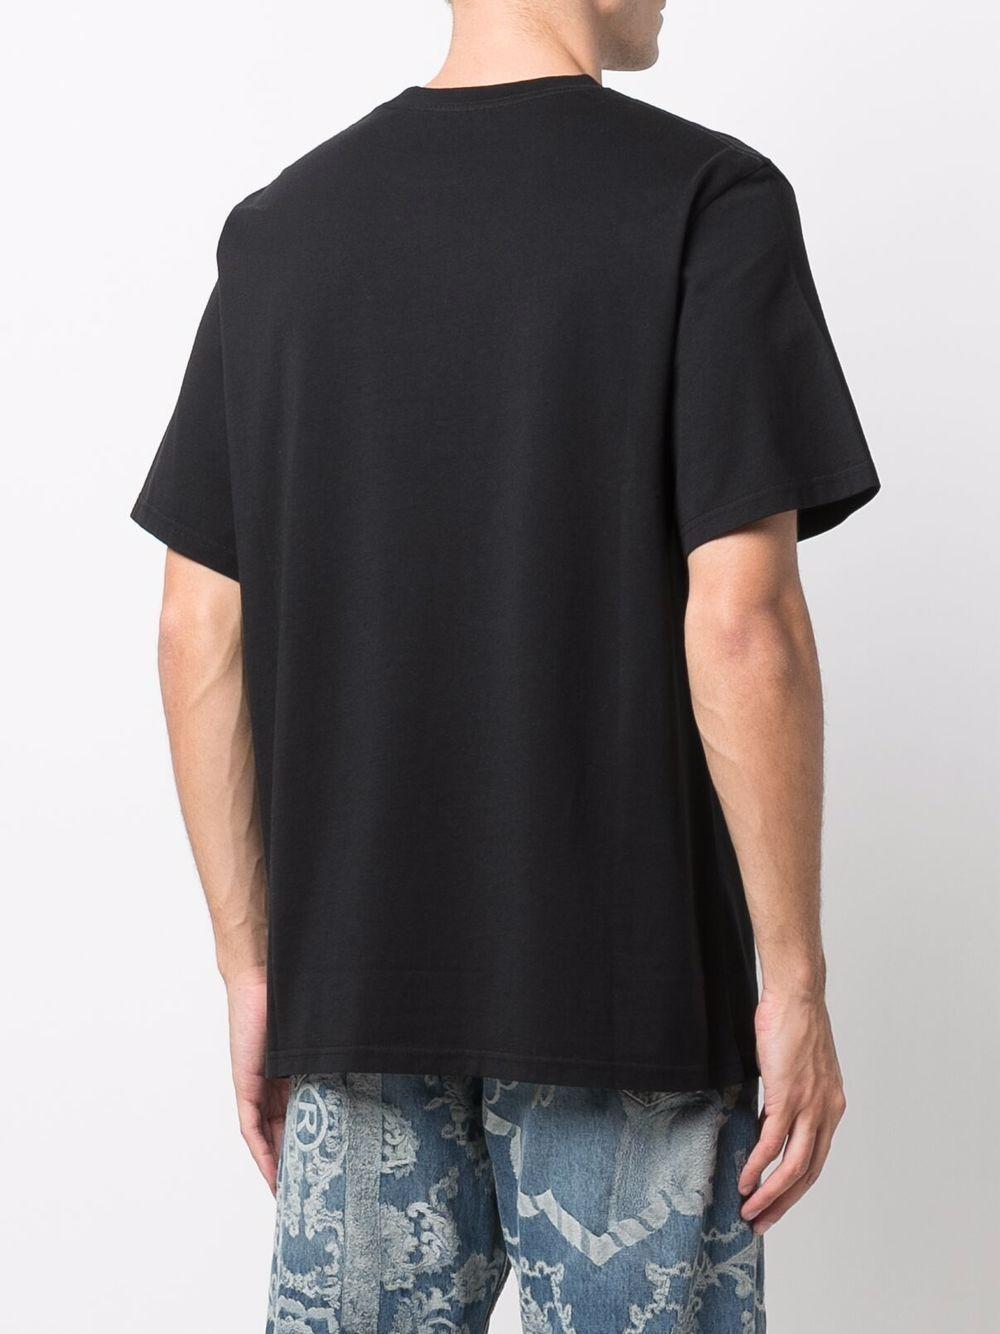 logo t-shirt man black in cotton MARTINE ROSE   T-shirts   M603JCMR009